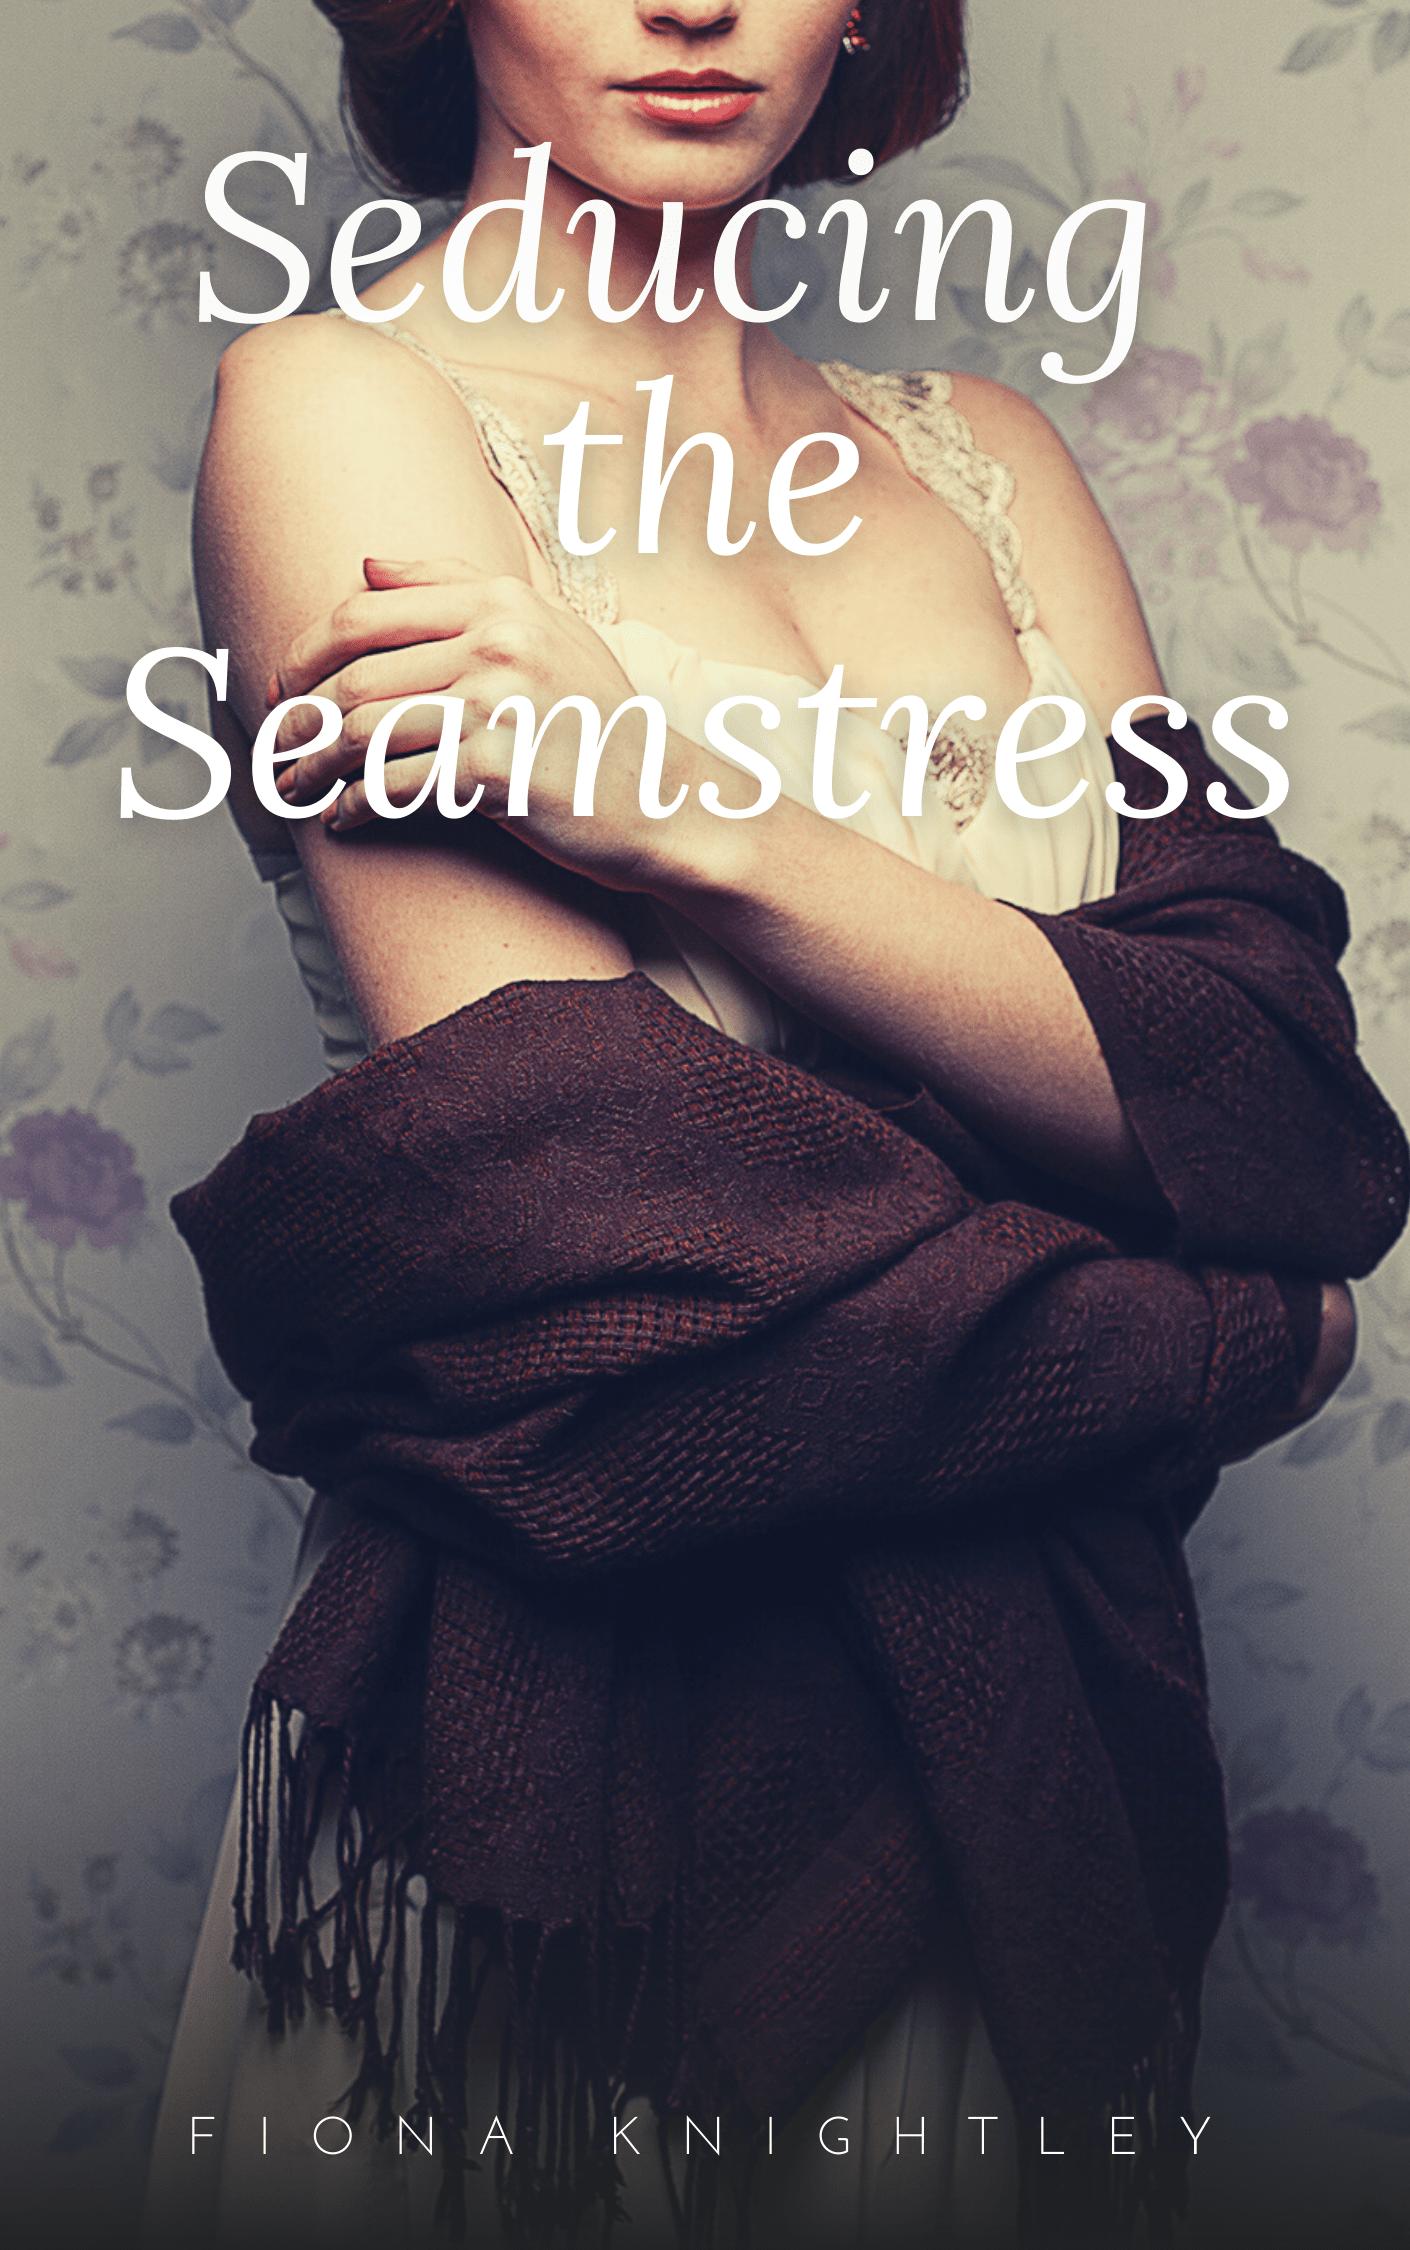 Seducing-The-Seamstress-Fiona-Knightley.png